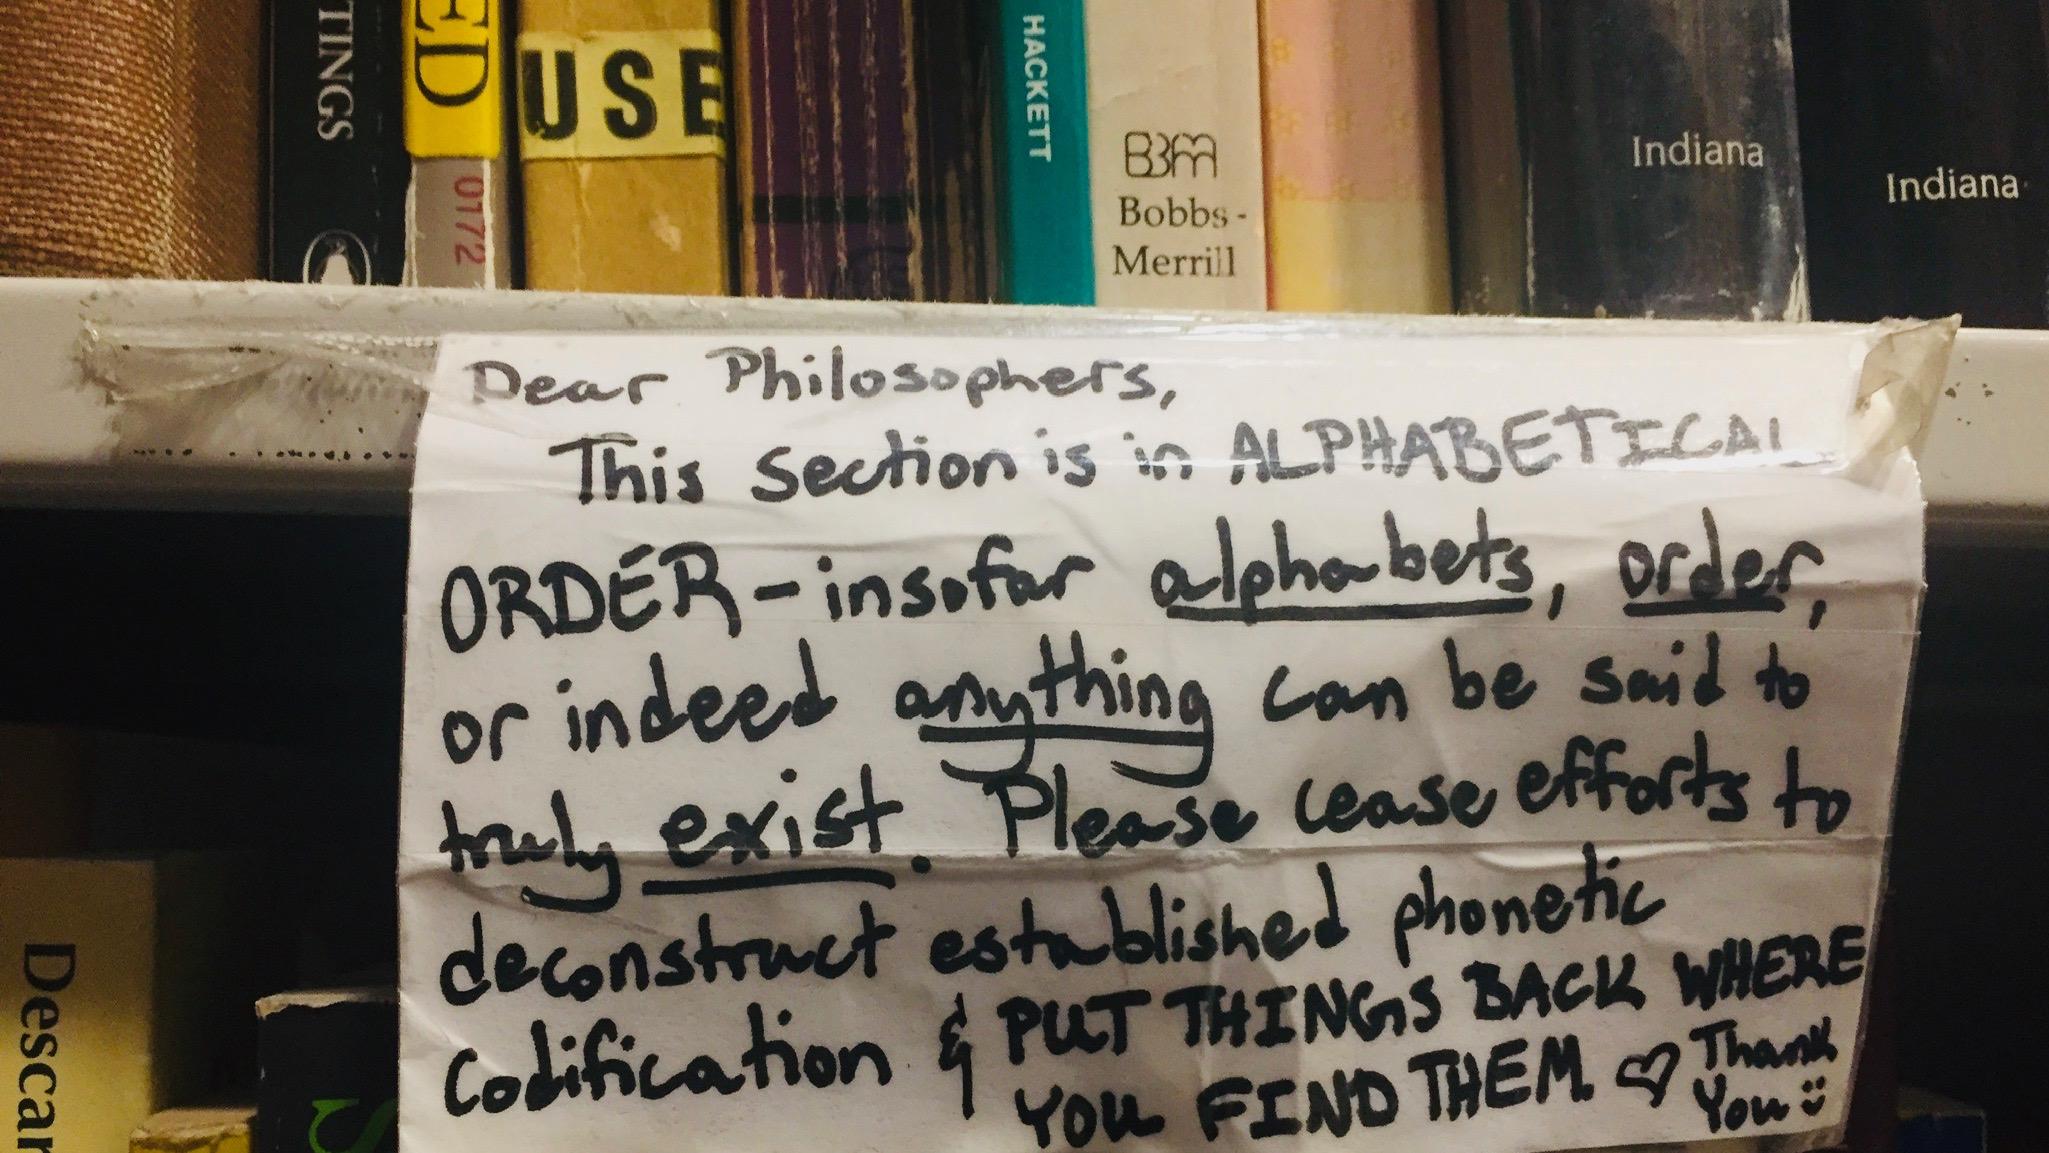 Used bookstore philosophy jokes.